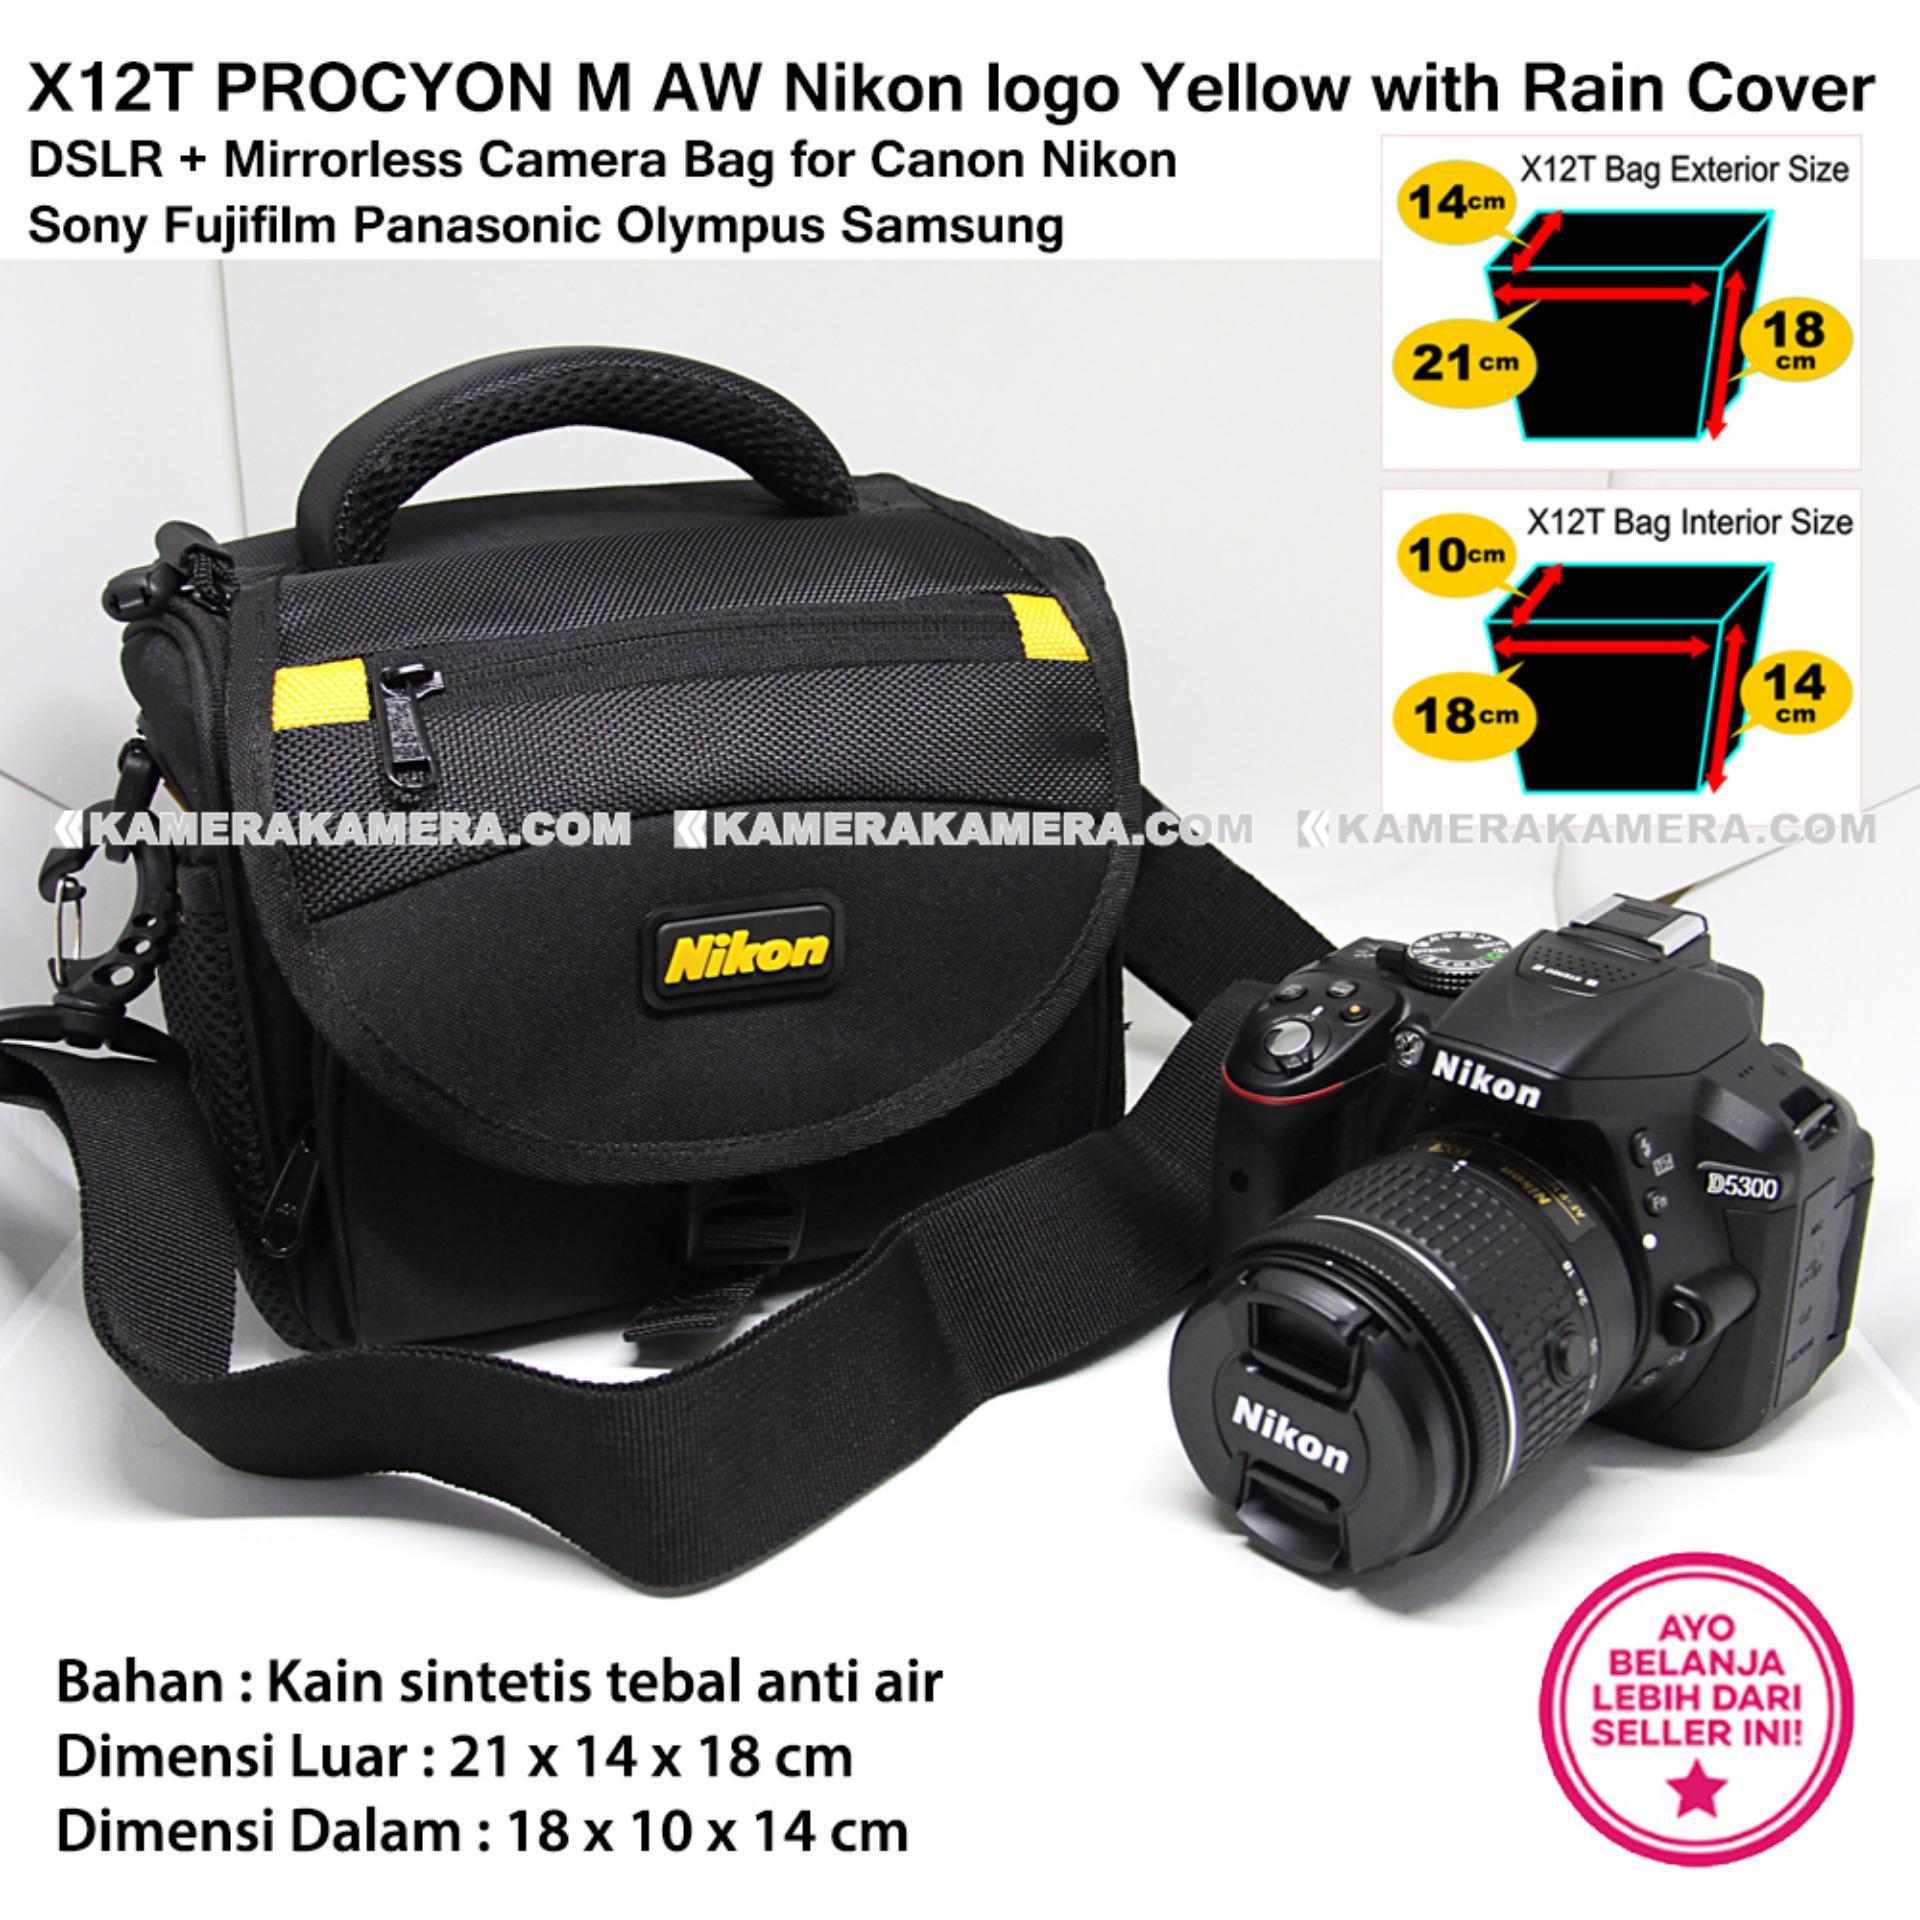 ... X12T PROCYON M AW Nikon logo Yellow with Rain Cover for DSLR + Mirrorless Camera Bag ...